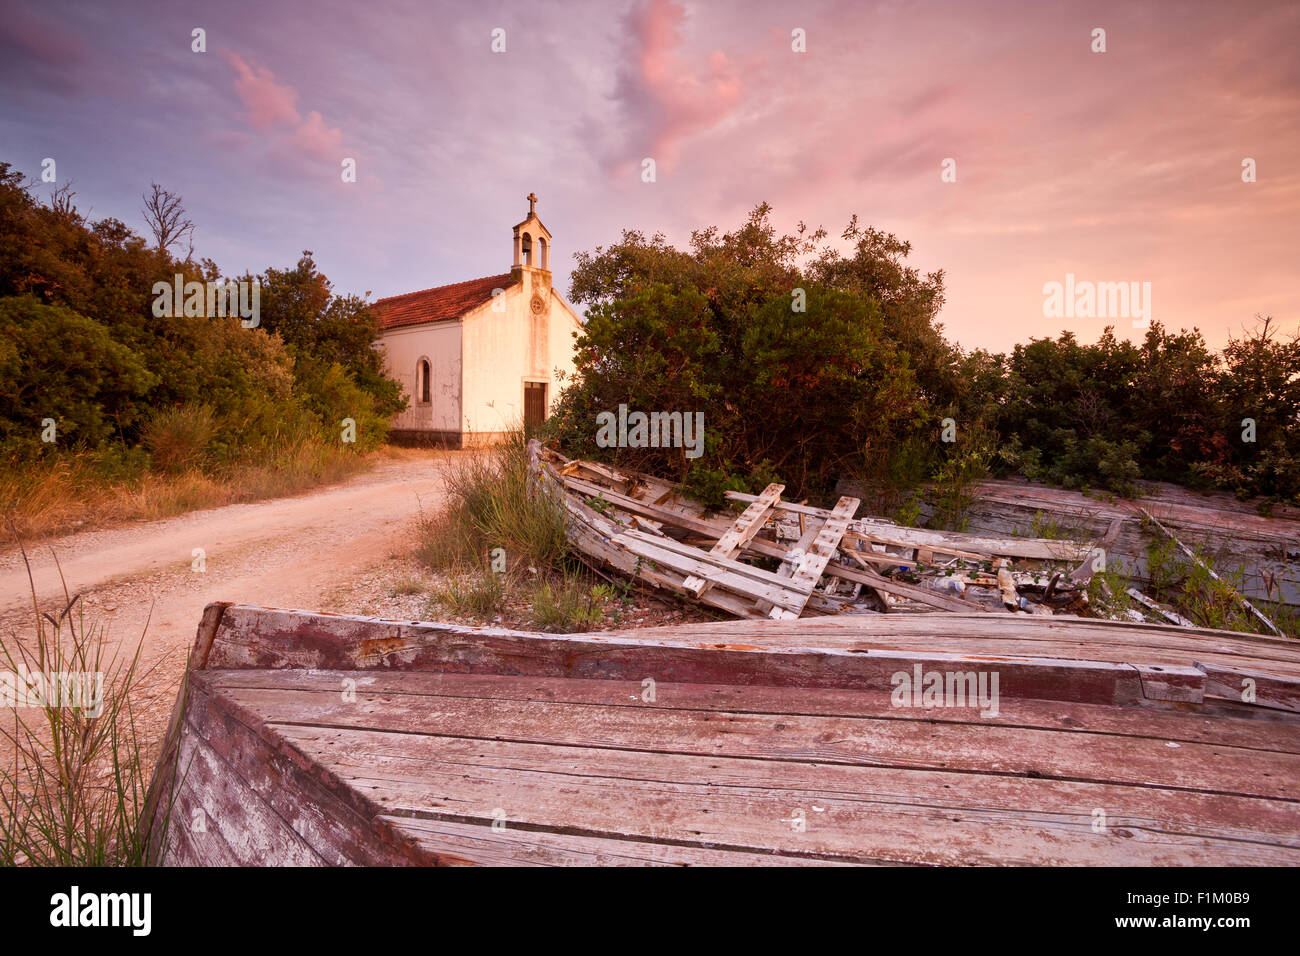 Church of Saints Cosmas and Damian in sunset, island Ugljan, Dalmatia, Croatia - Stock Image